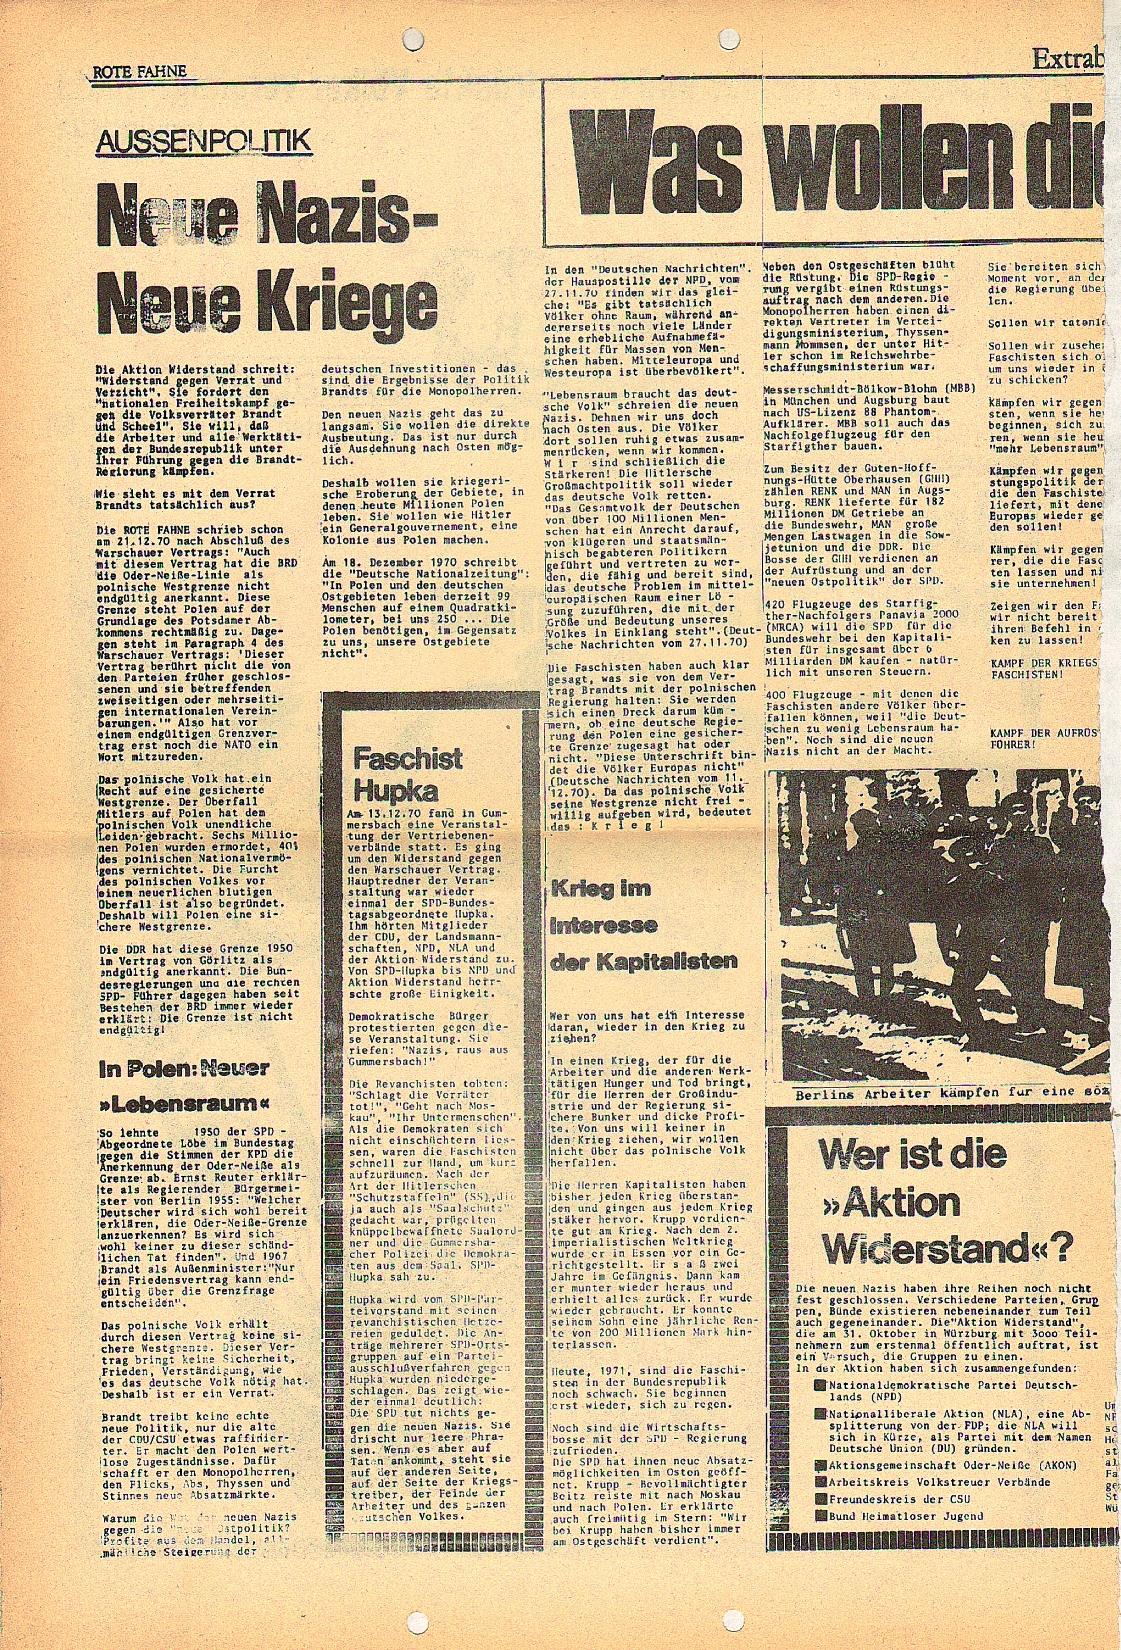 Rote Fahne, 2. Jg., Januar 1971, Extrablatt, Seite 2